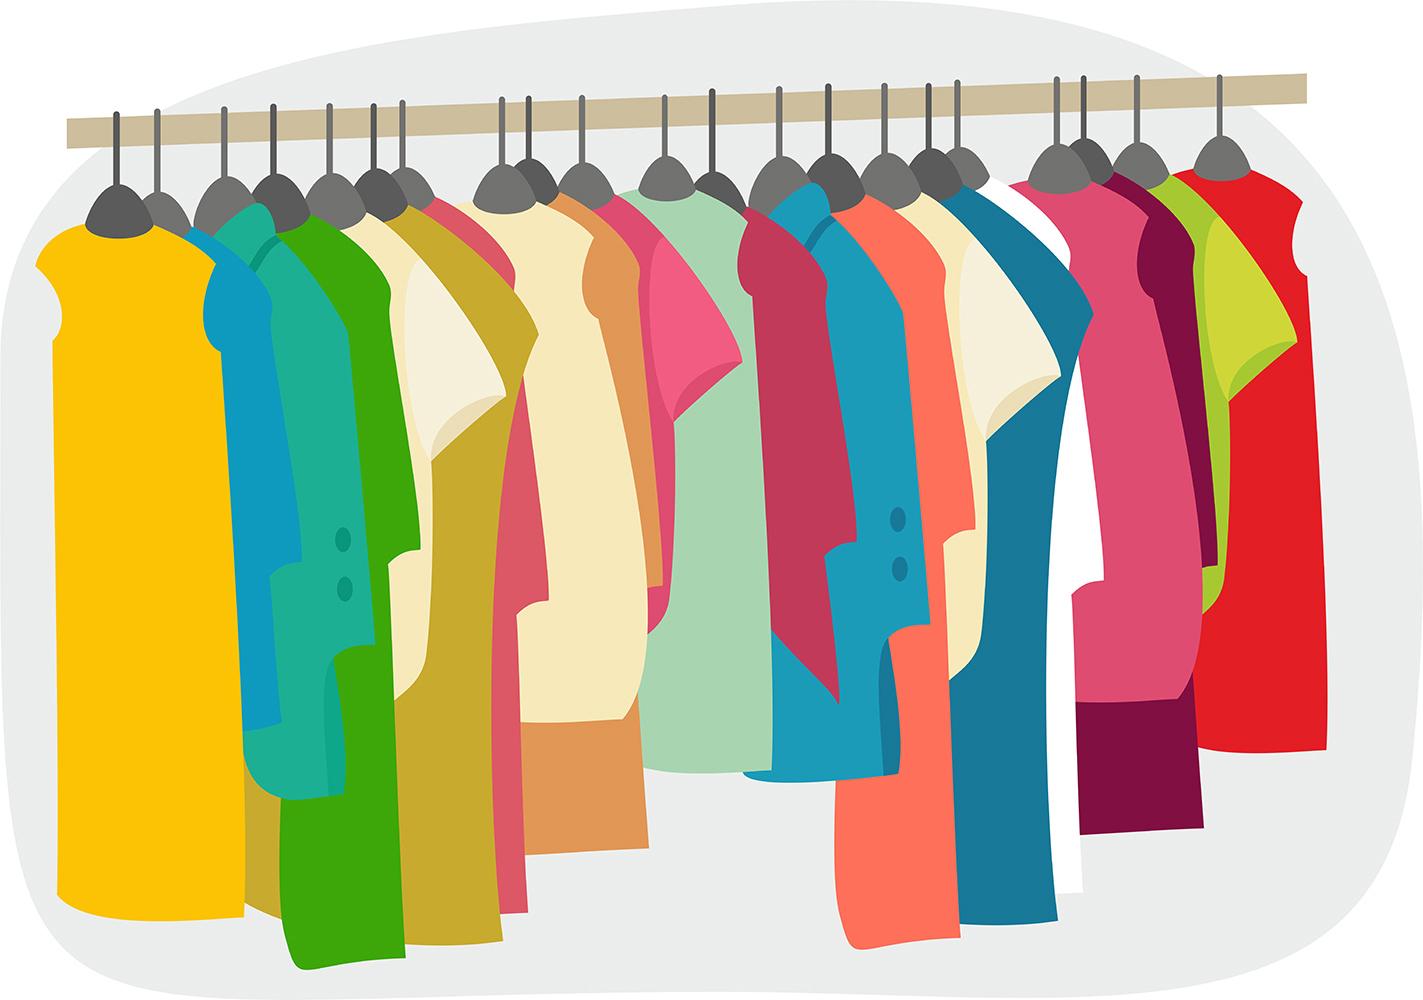 Free garage images yard. Clothing clipart clothing sale